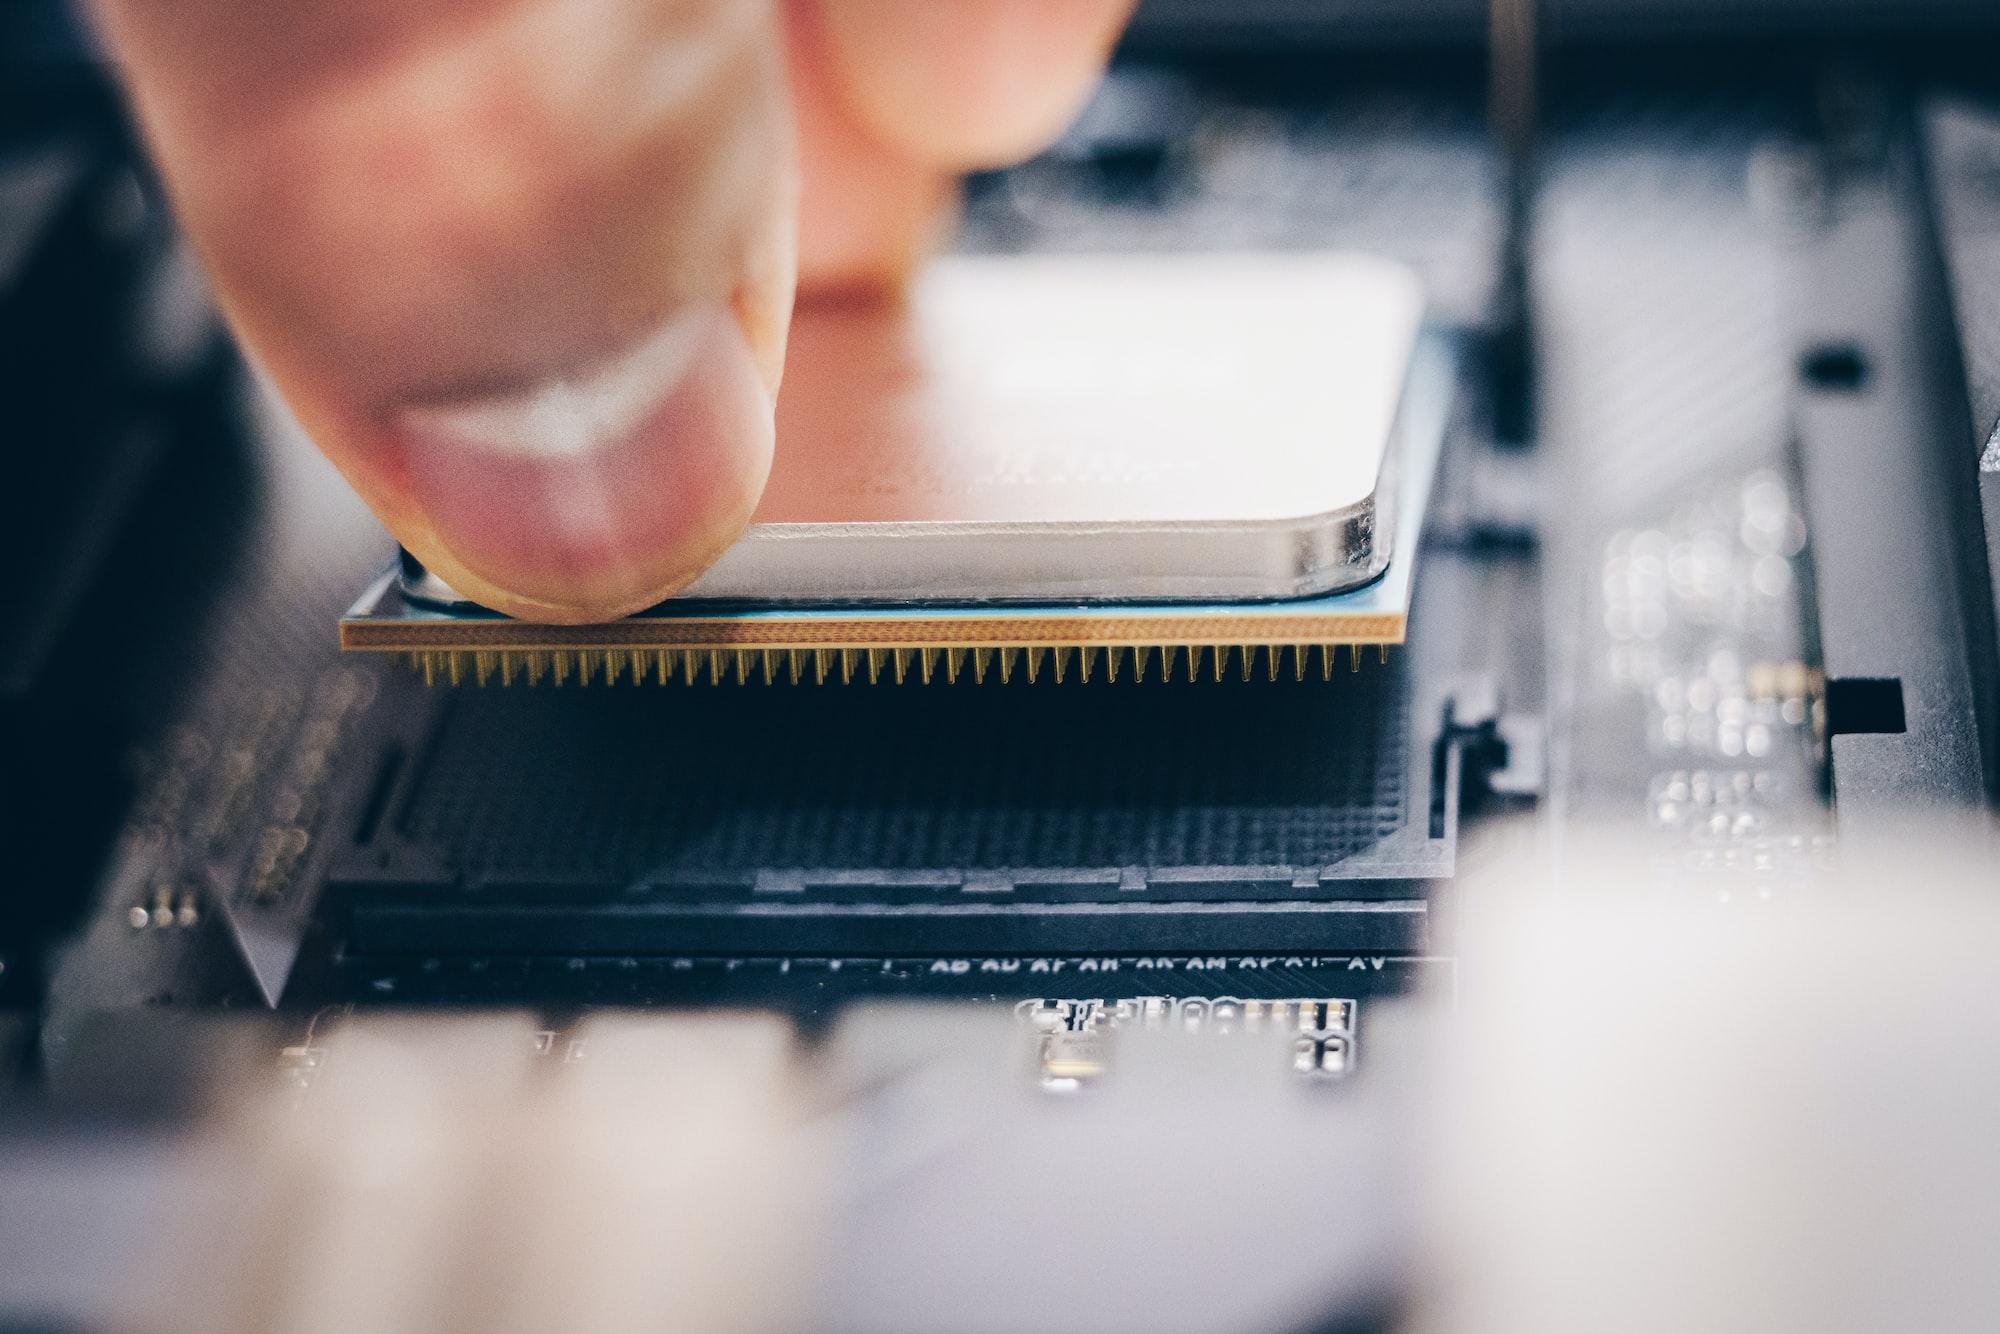 Un super computer Intel per rendering 3D e Intelligenza Artificiale.